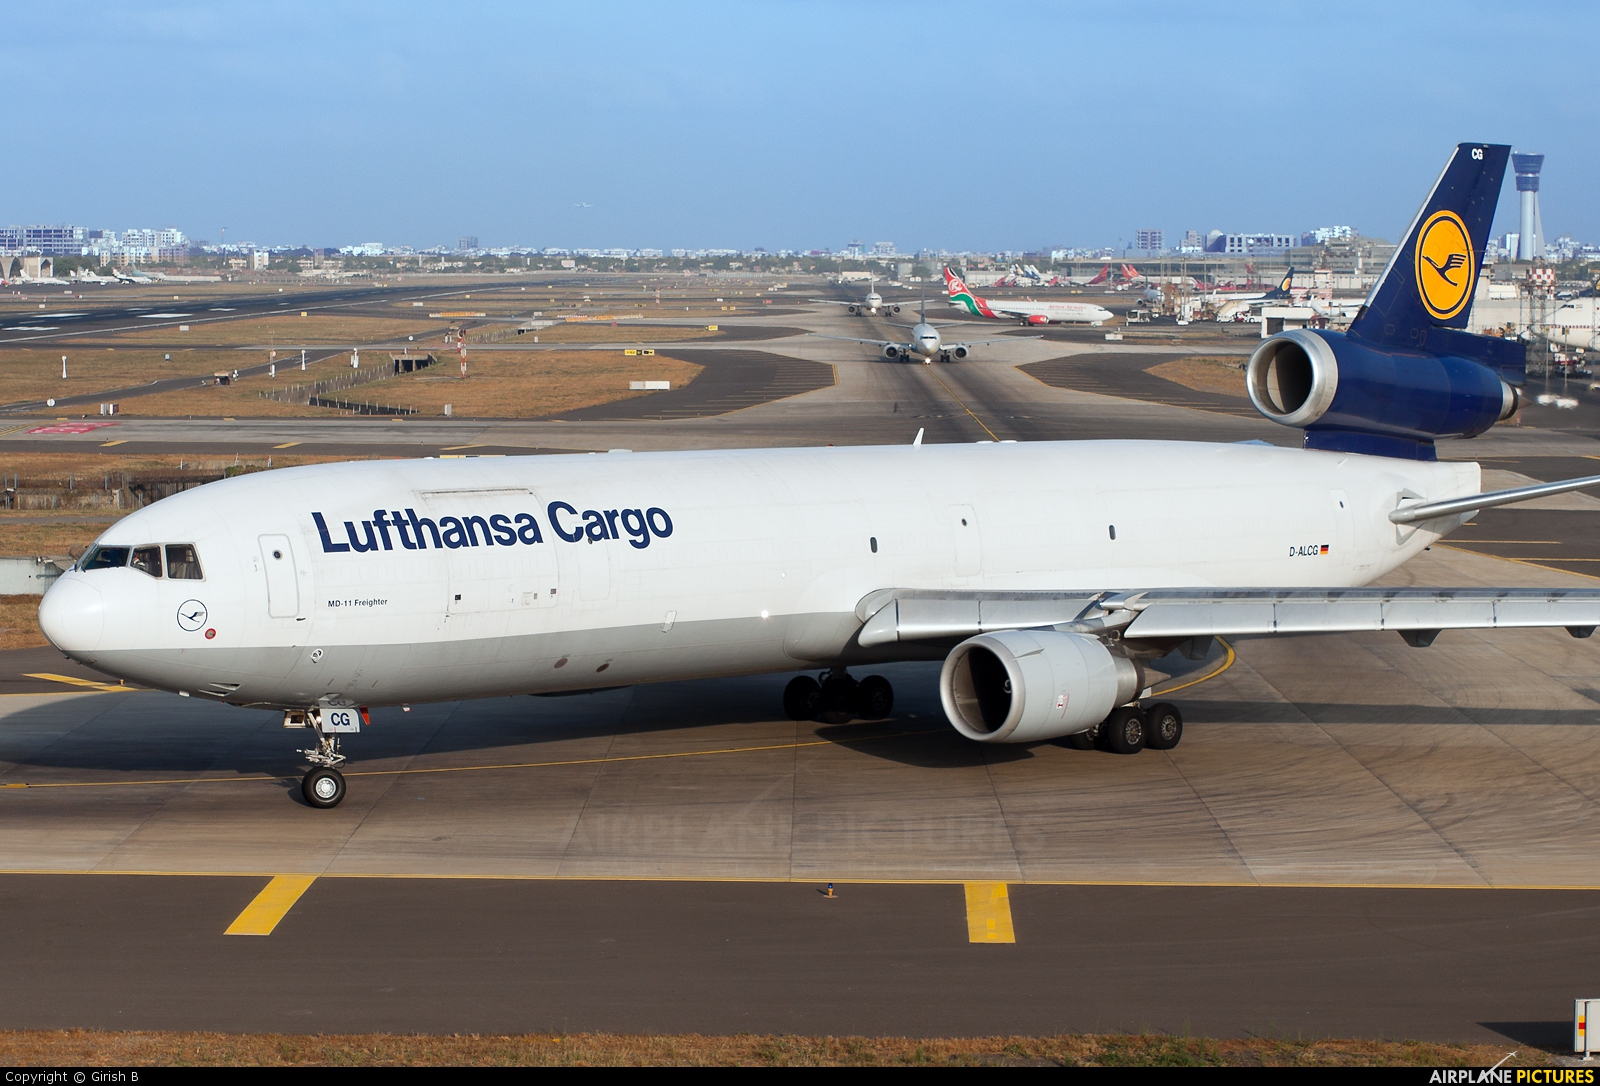 Lufthansa Cargo D-ALCG aircraft at Mumbai - Chhatrapati Shivaji Intl